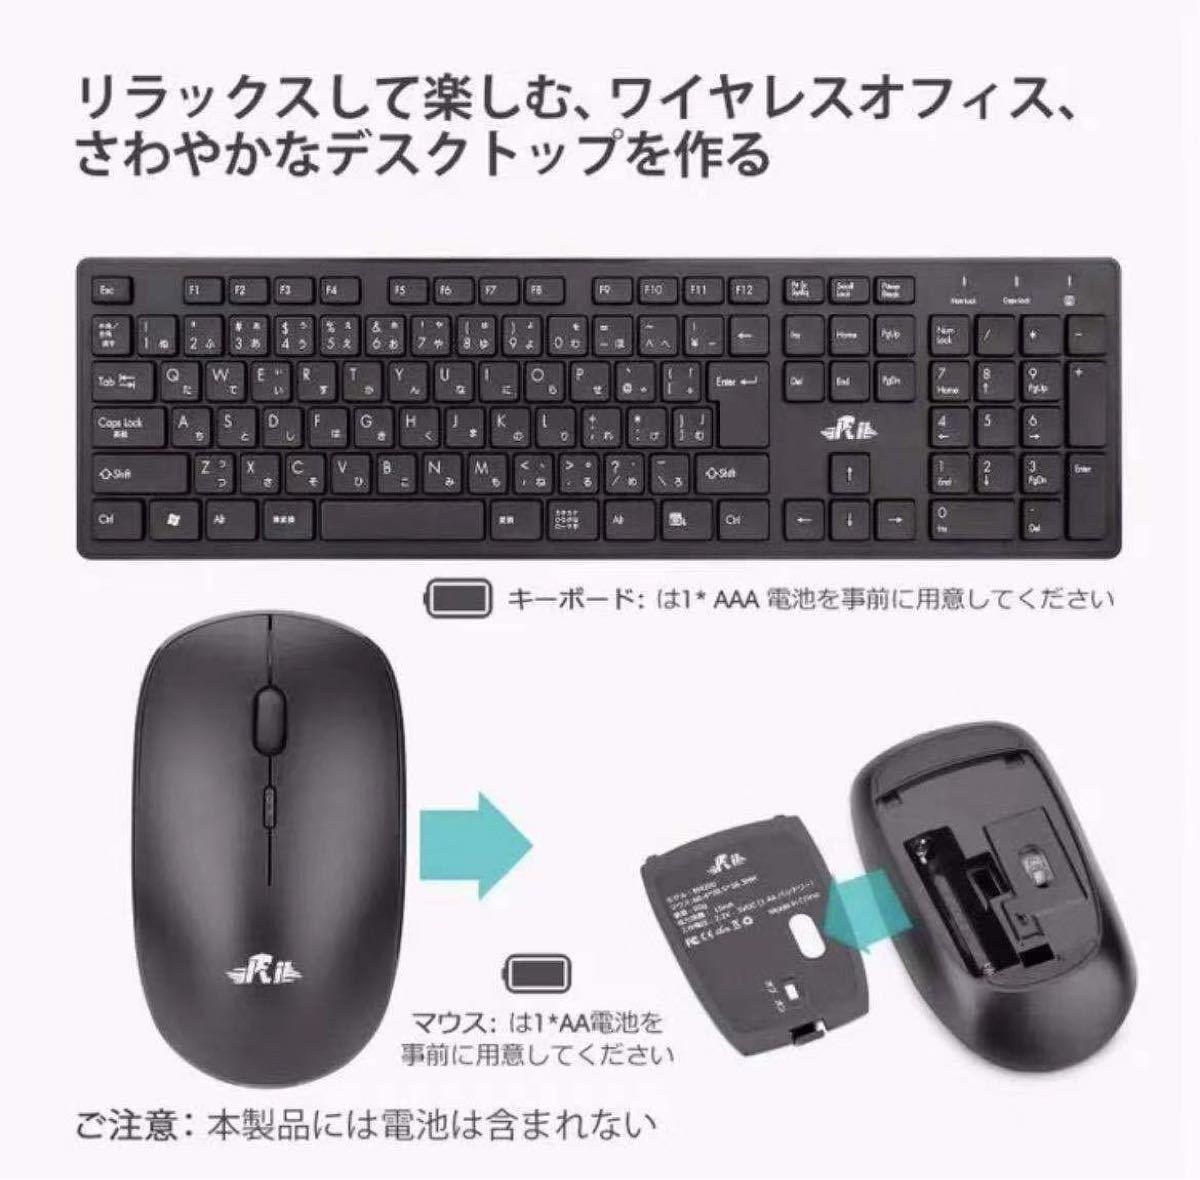 Bluetooth ワイヤレスキーボード マウスセット キーボード 長距離使用可